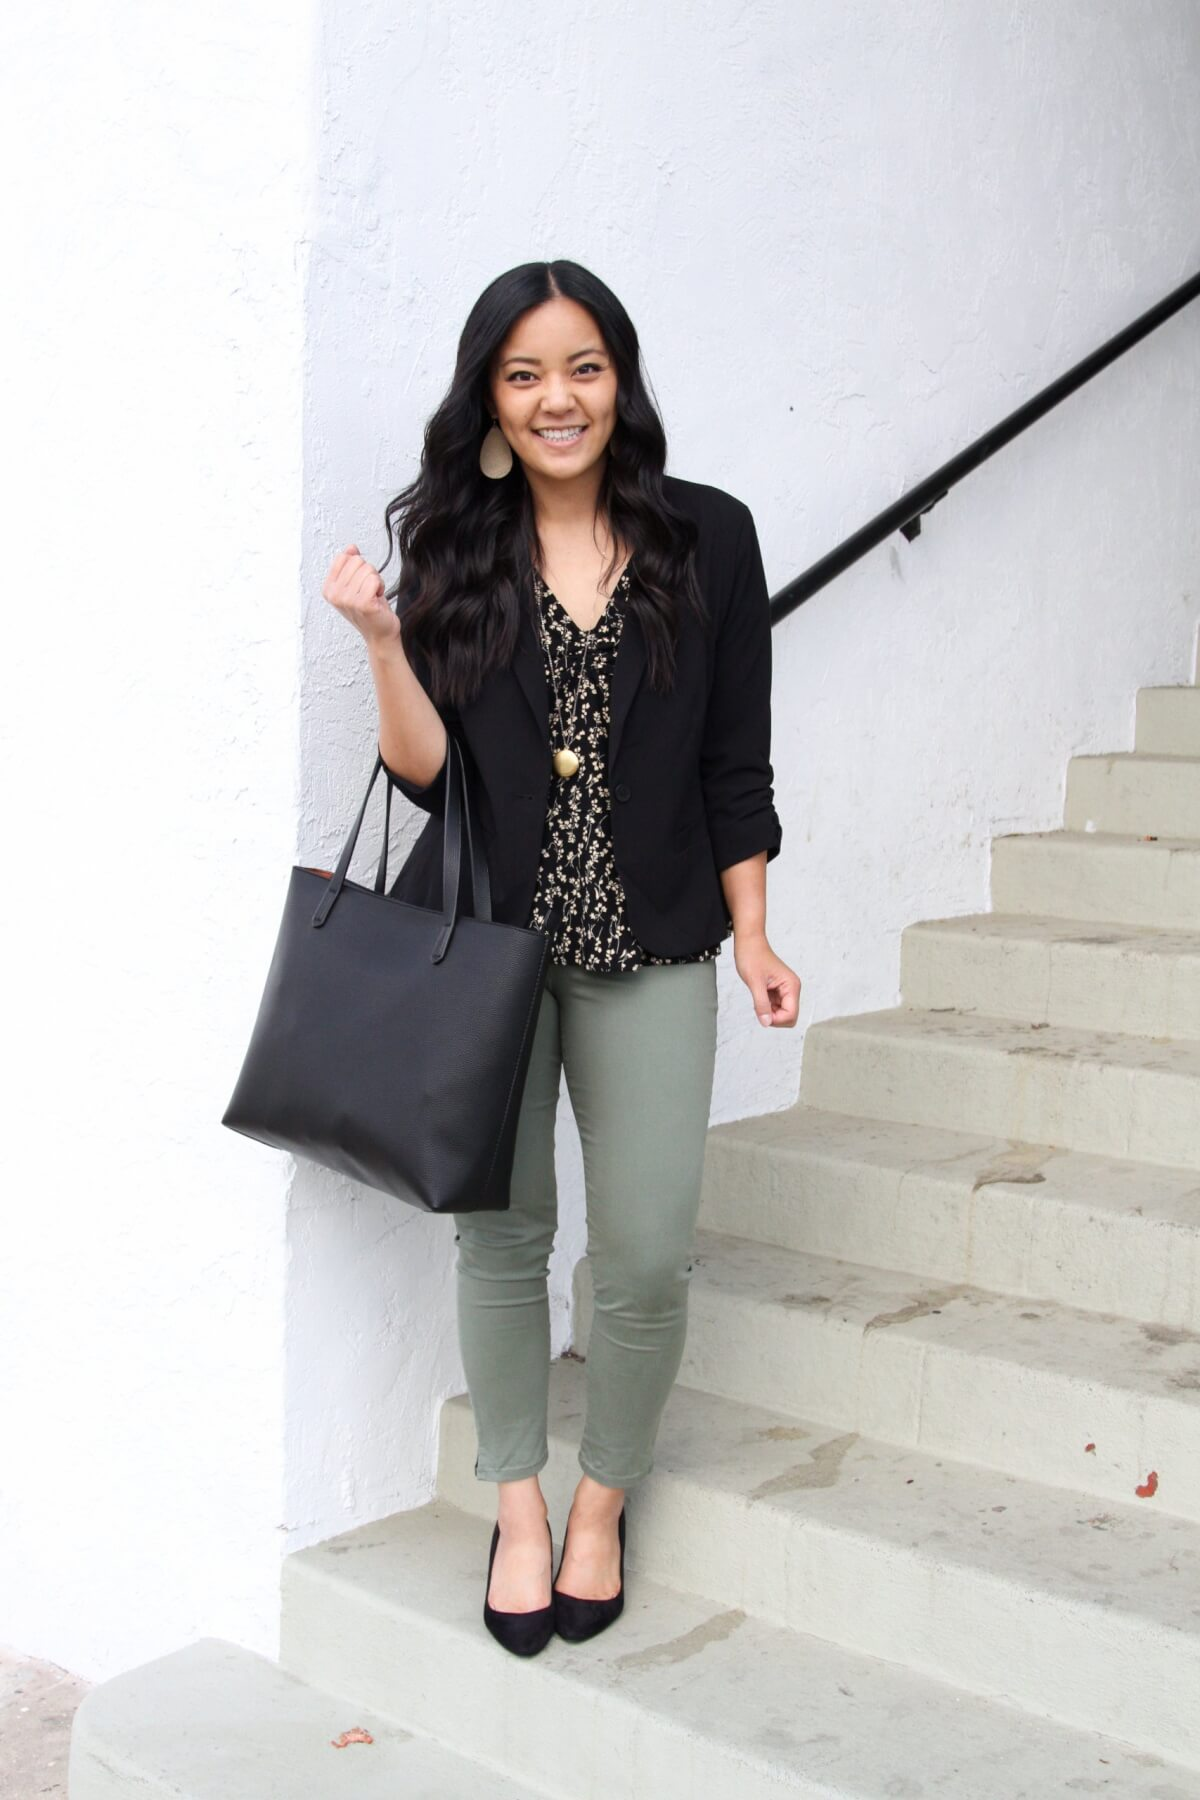 Work Outfit: black blazer + black and ivory floral top + olive pants + black pumps + pendant necklace + black tote